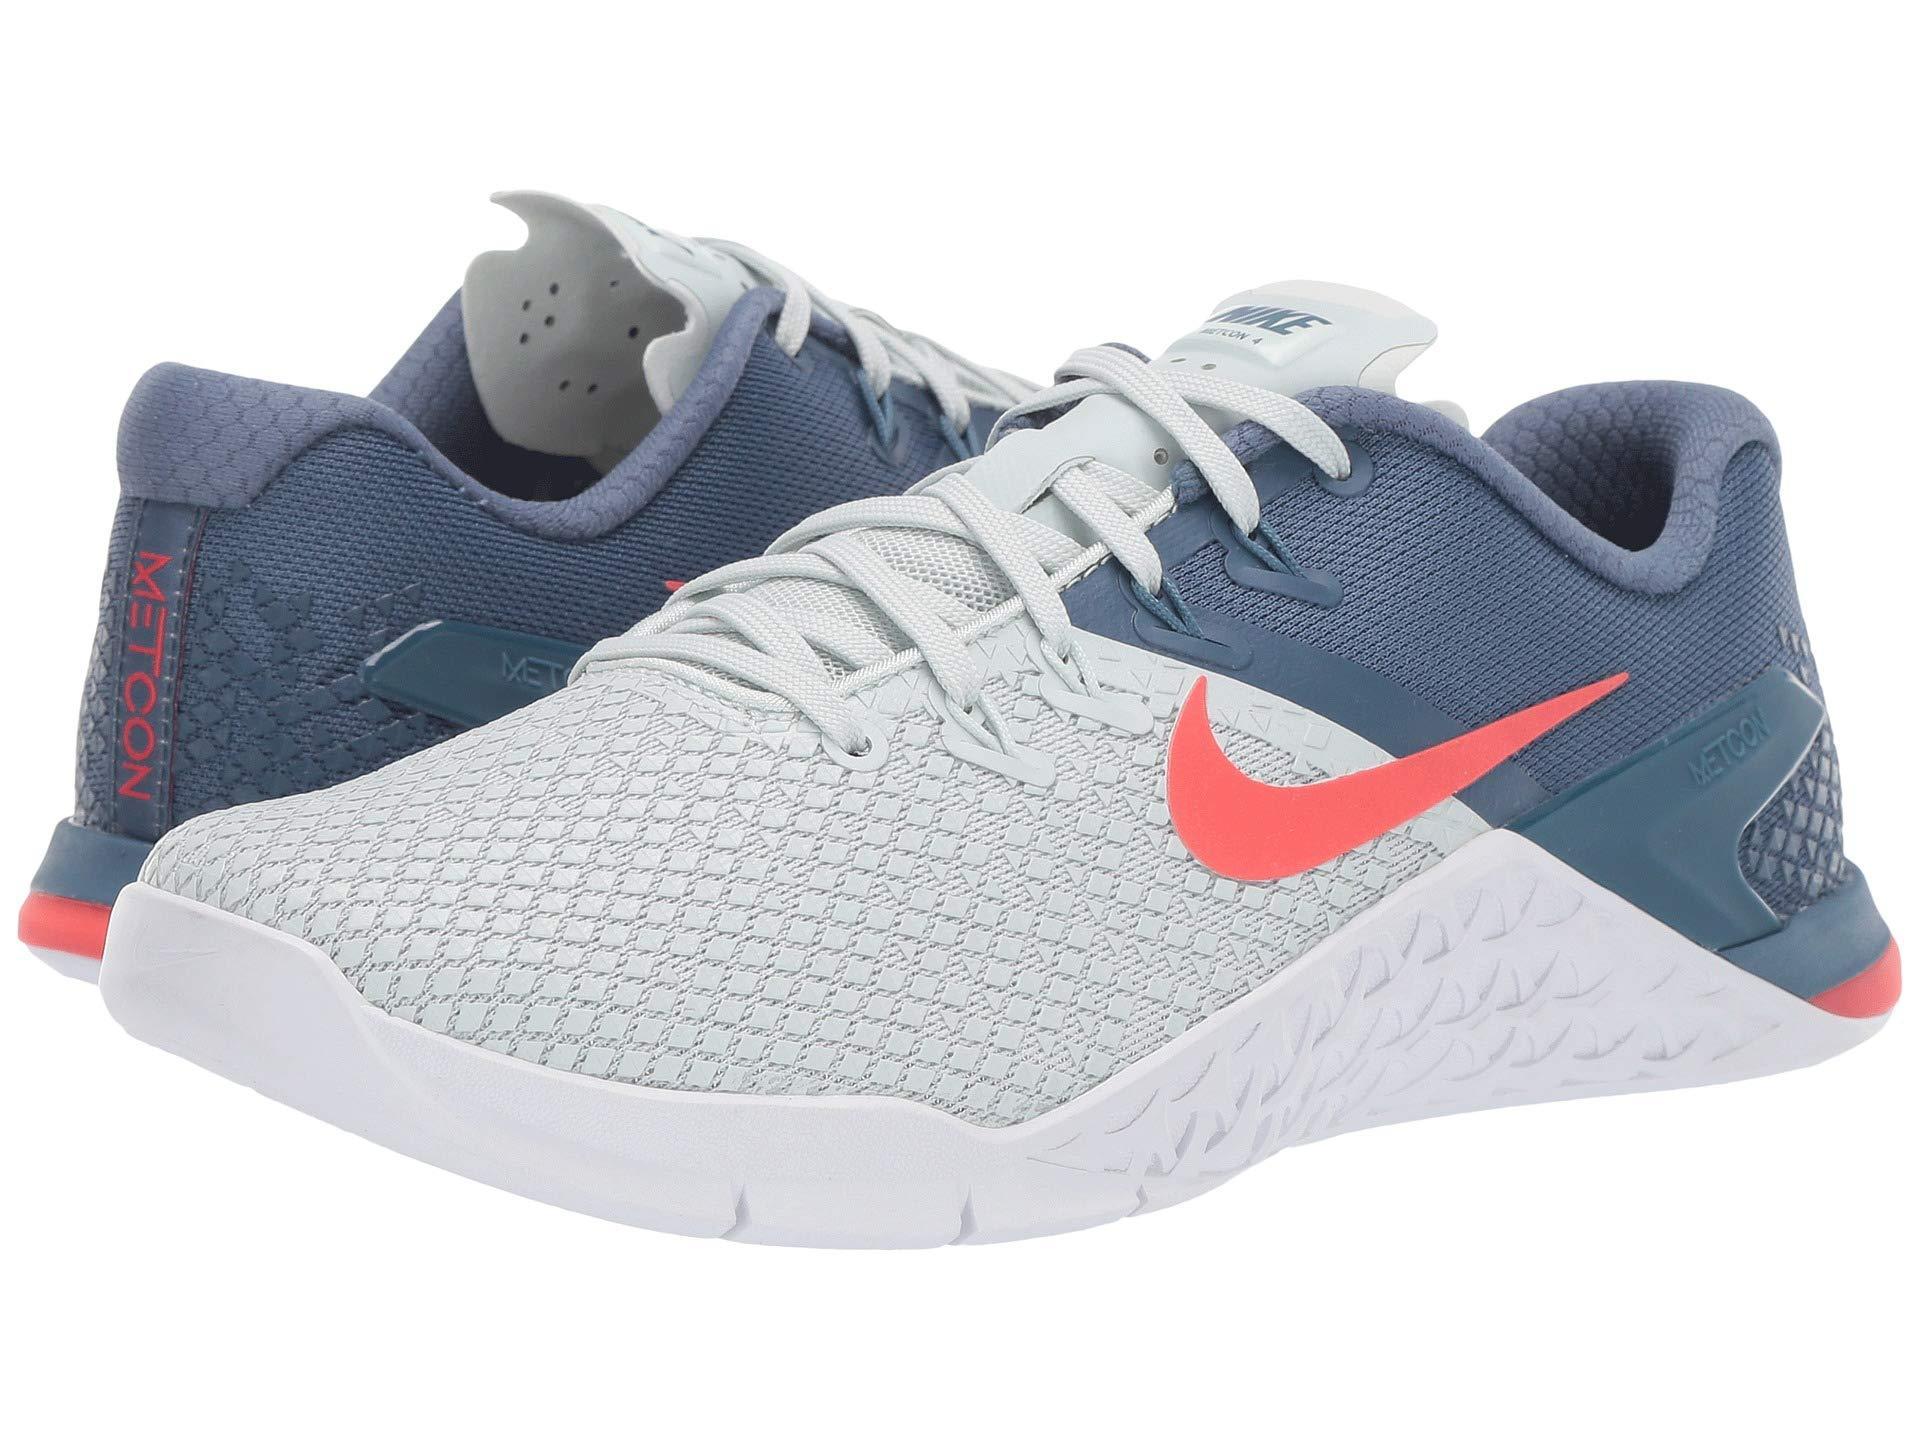 83edc487ca2d5 Nike. Metcon 4 Xd (atmosphere Grey true Berry plum Dust) Women s Cross Training  Shoes